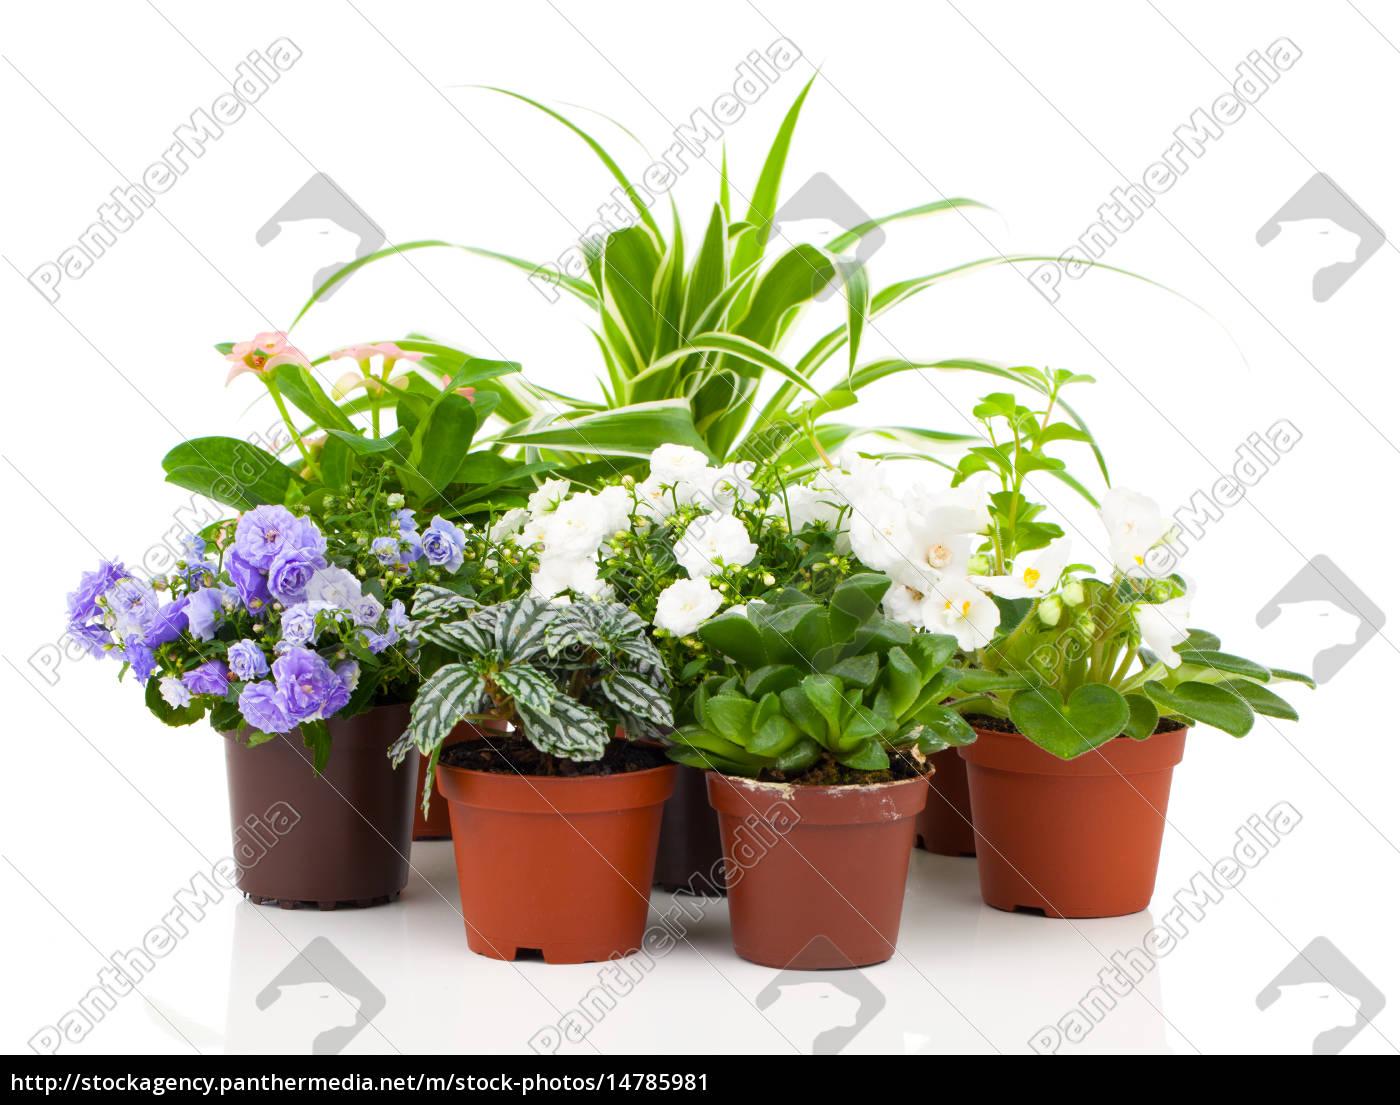 jungpflanzen, in, blumentopf, -, glockenblumen, , saintpaulia, - 14785981